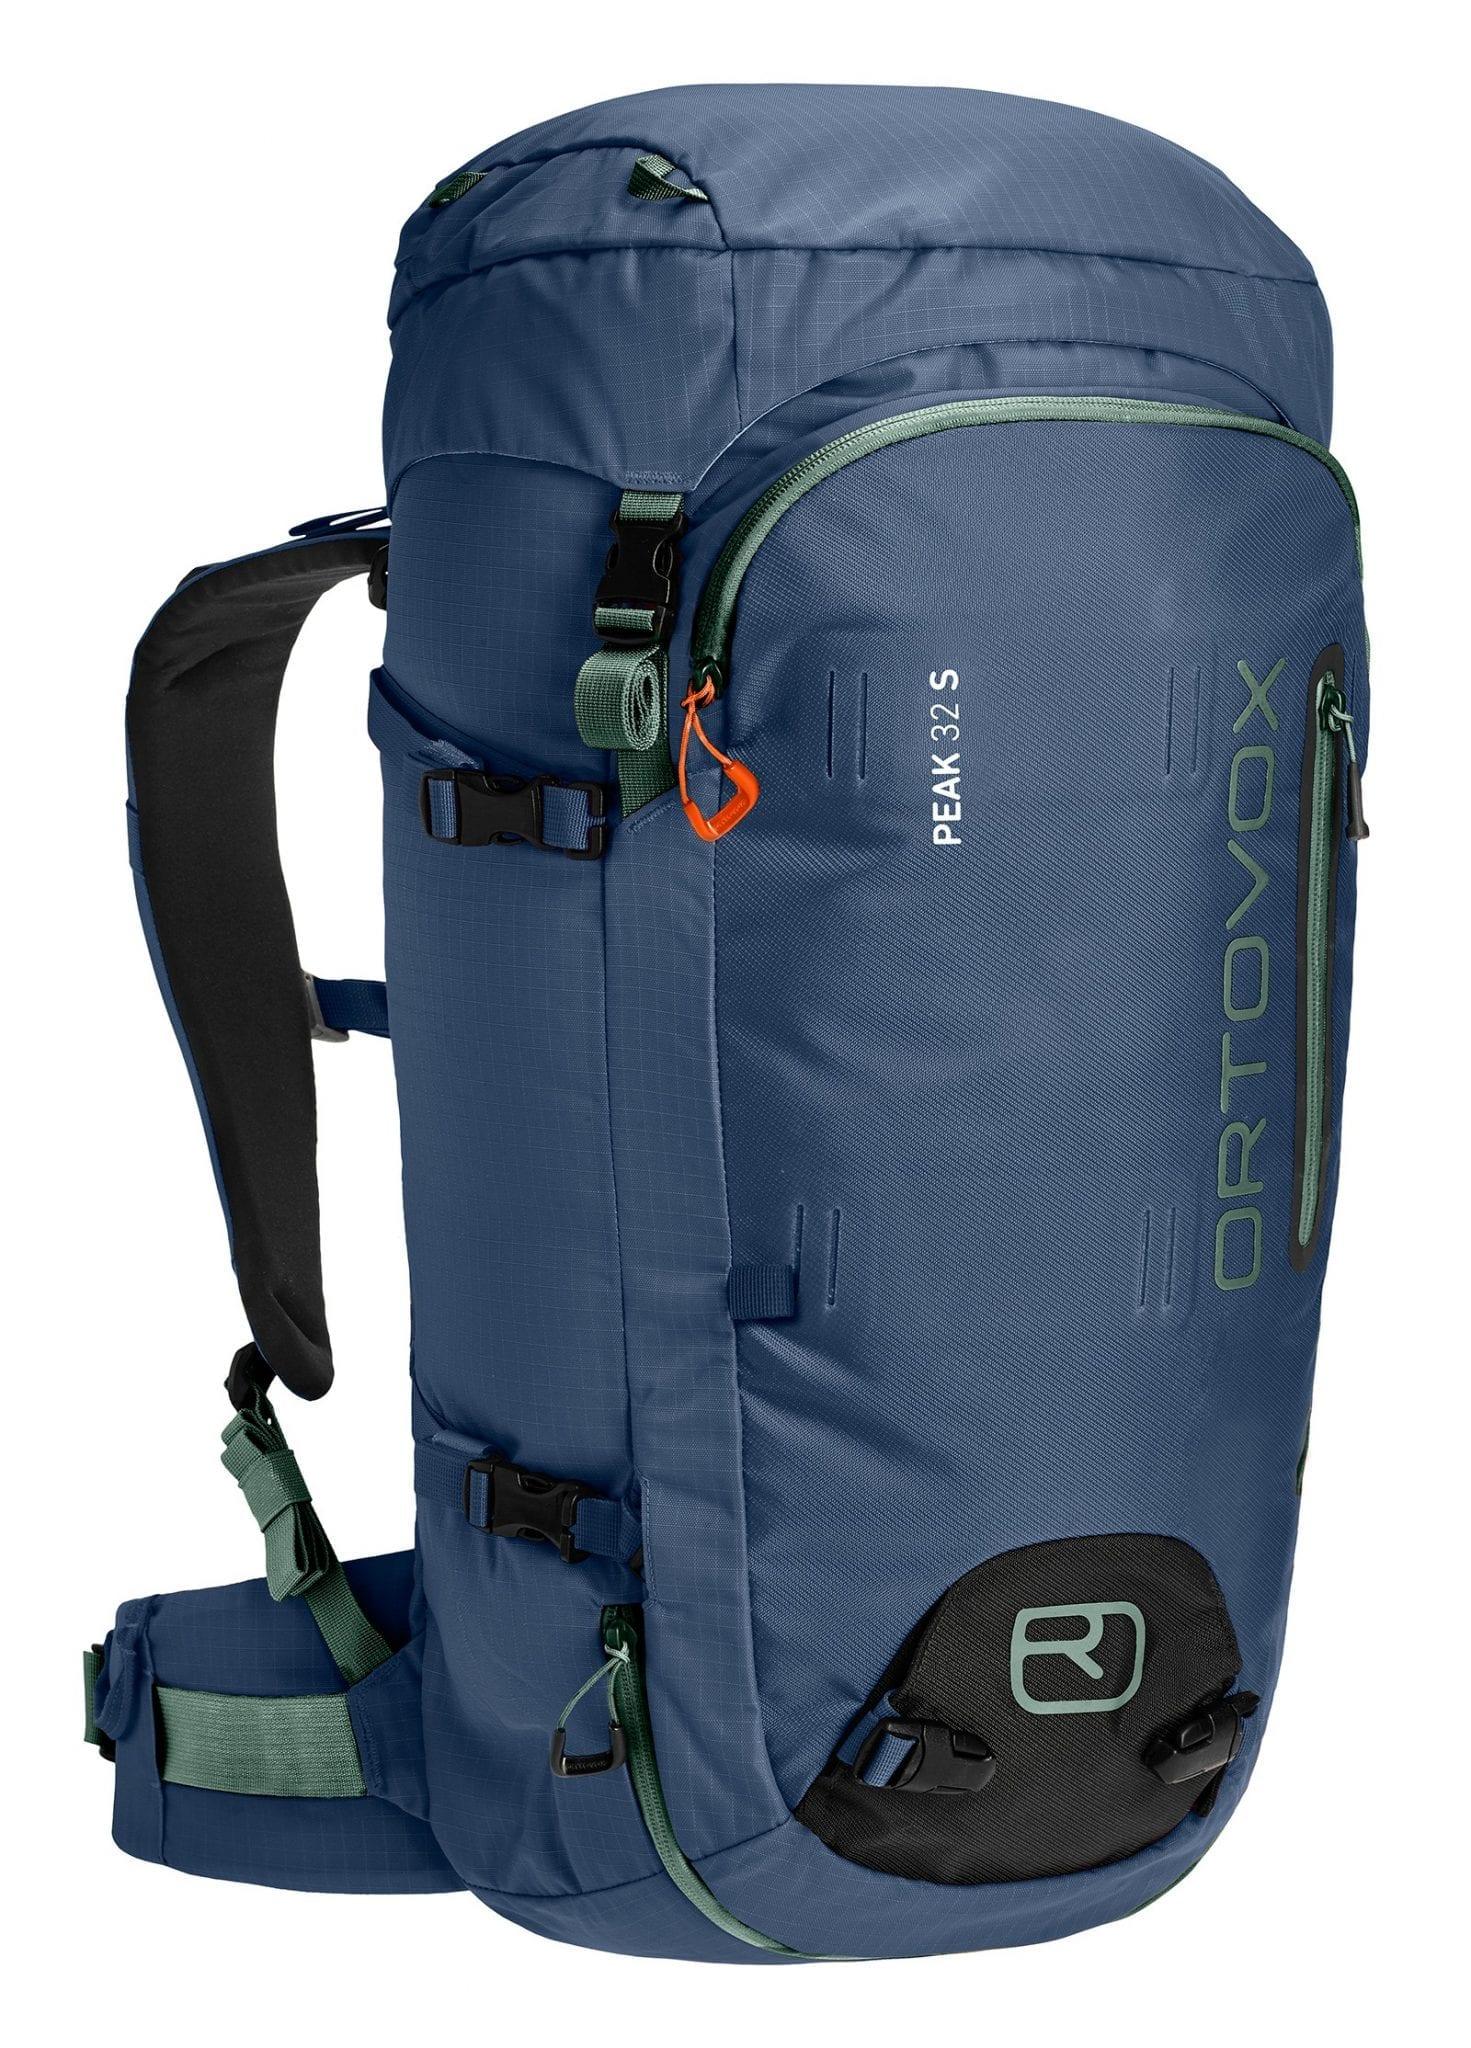 Ortovox Peak 32 S - Night Blue